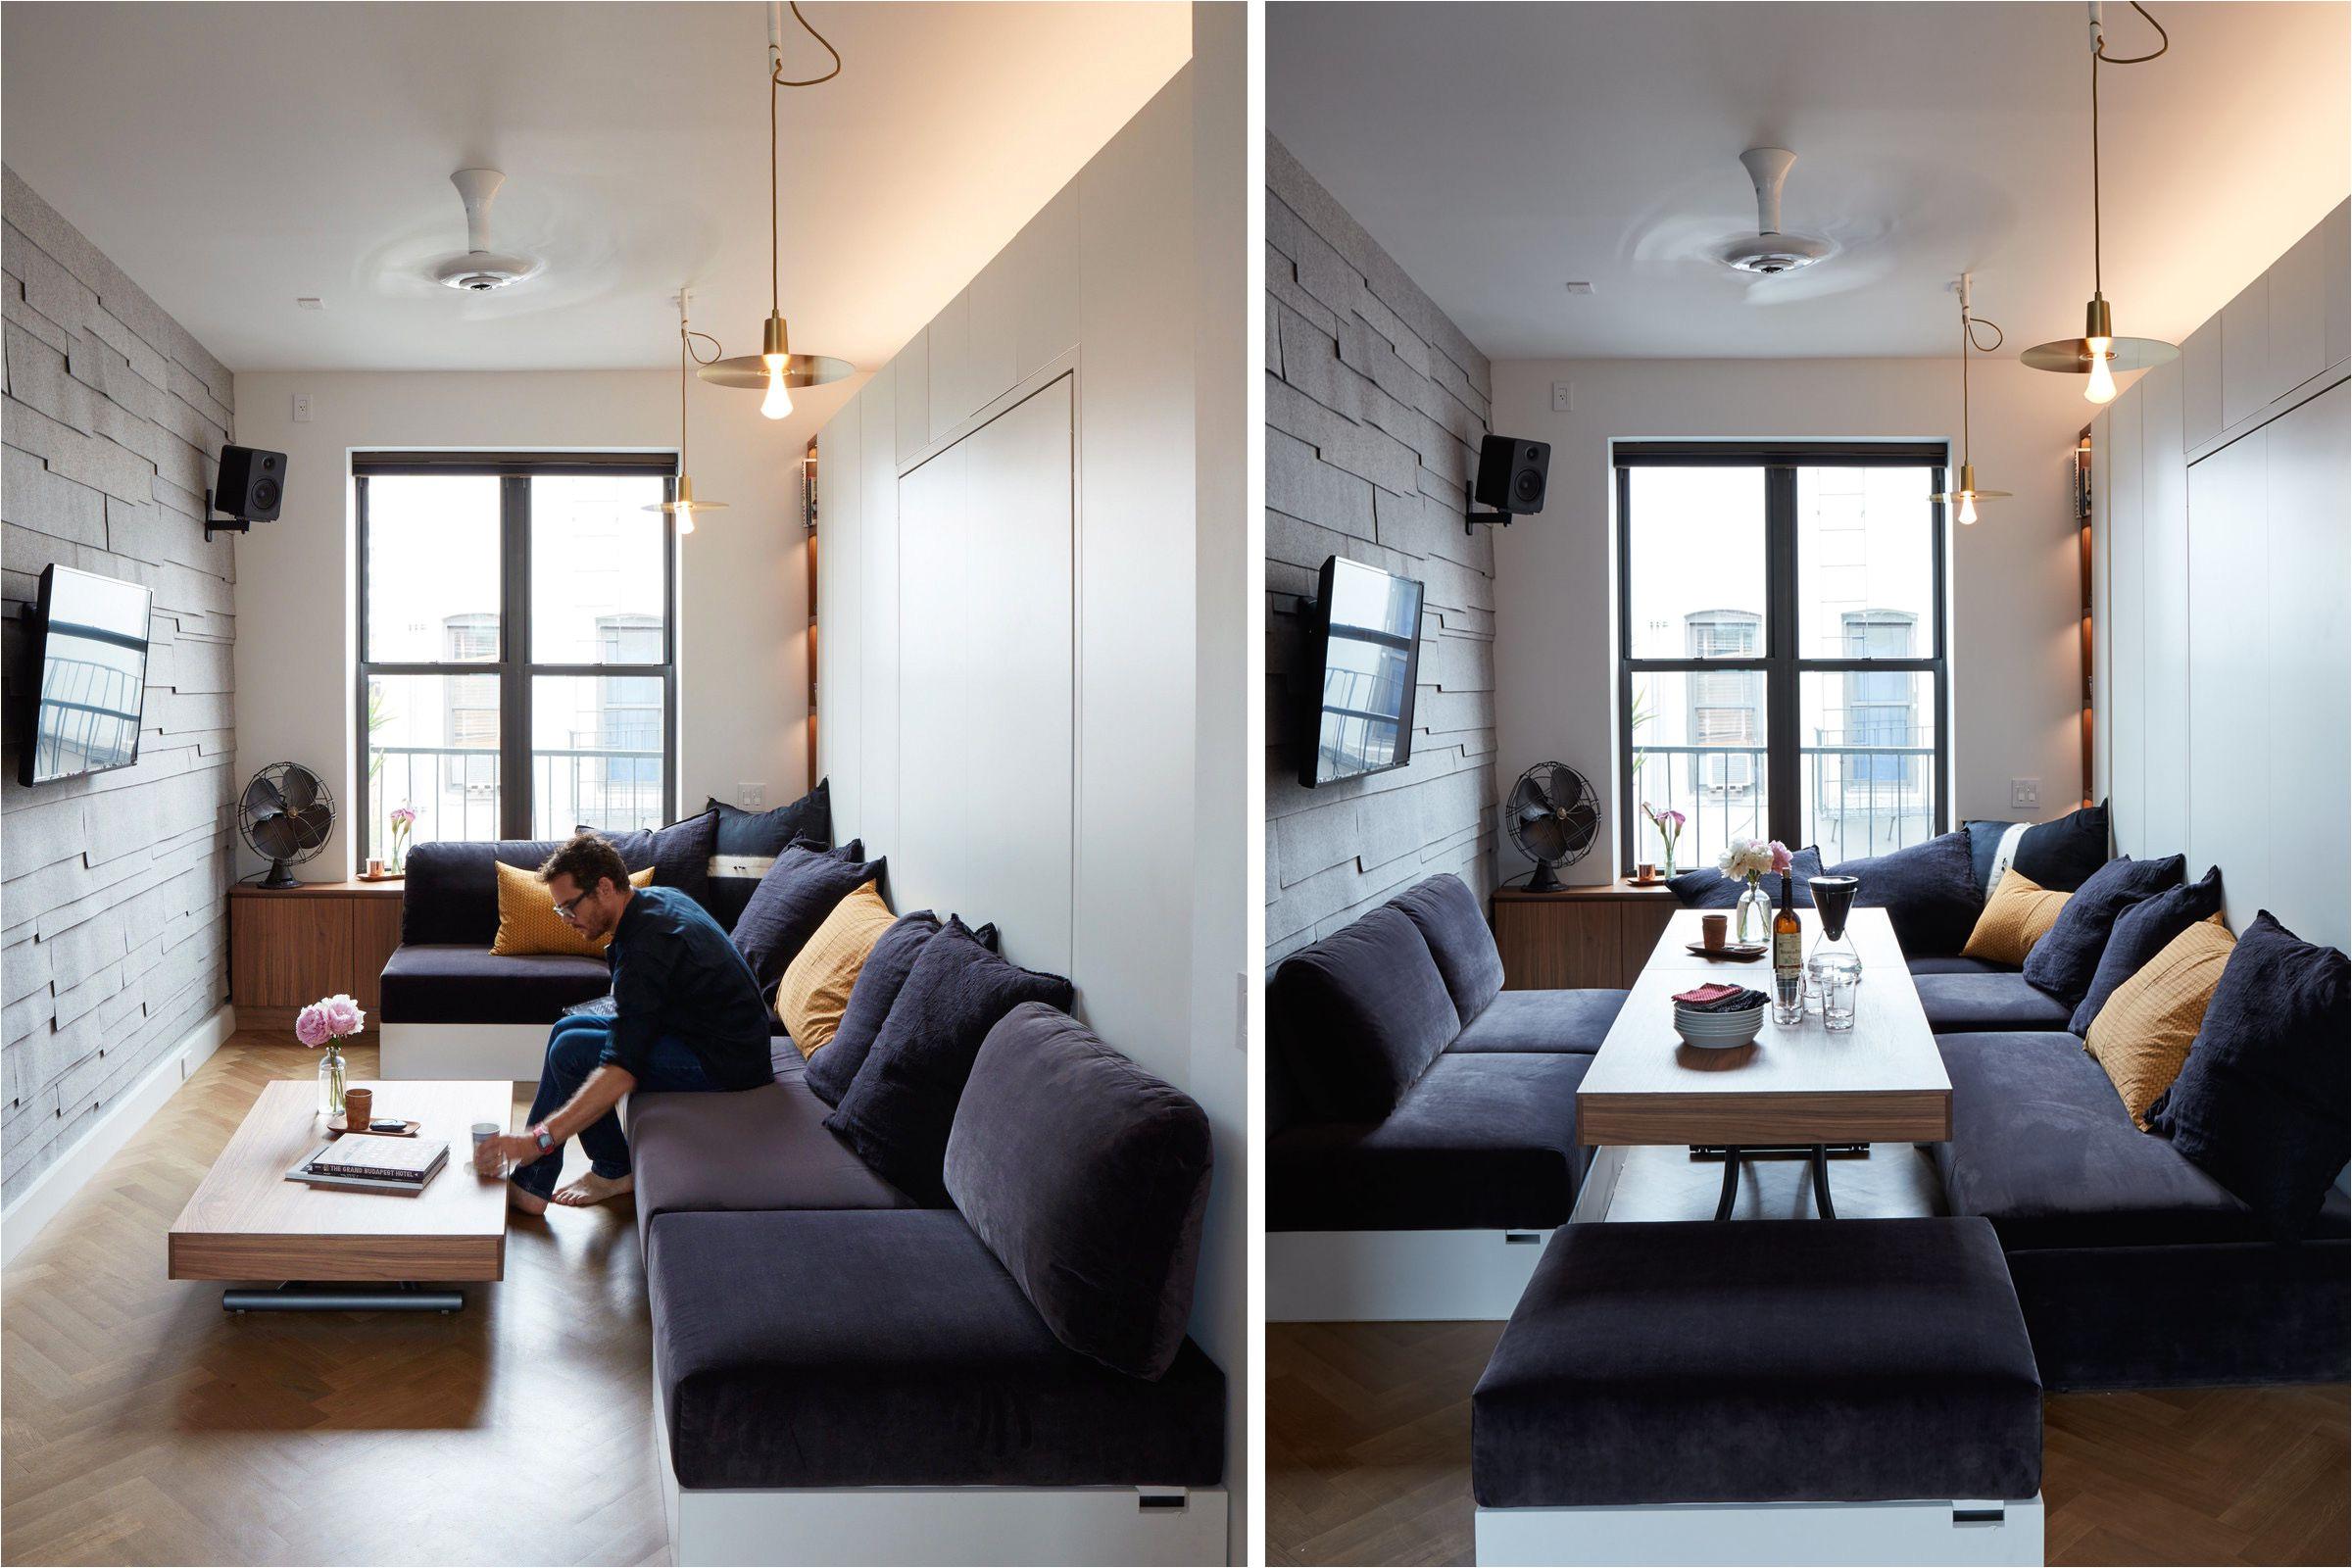 double duty furniture room smallspaces 58768ced5f9b584db3ac5106 jpg